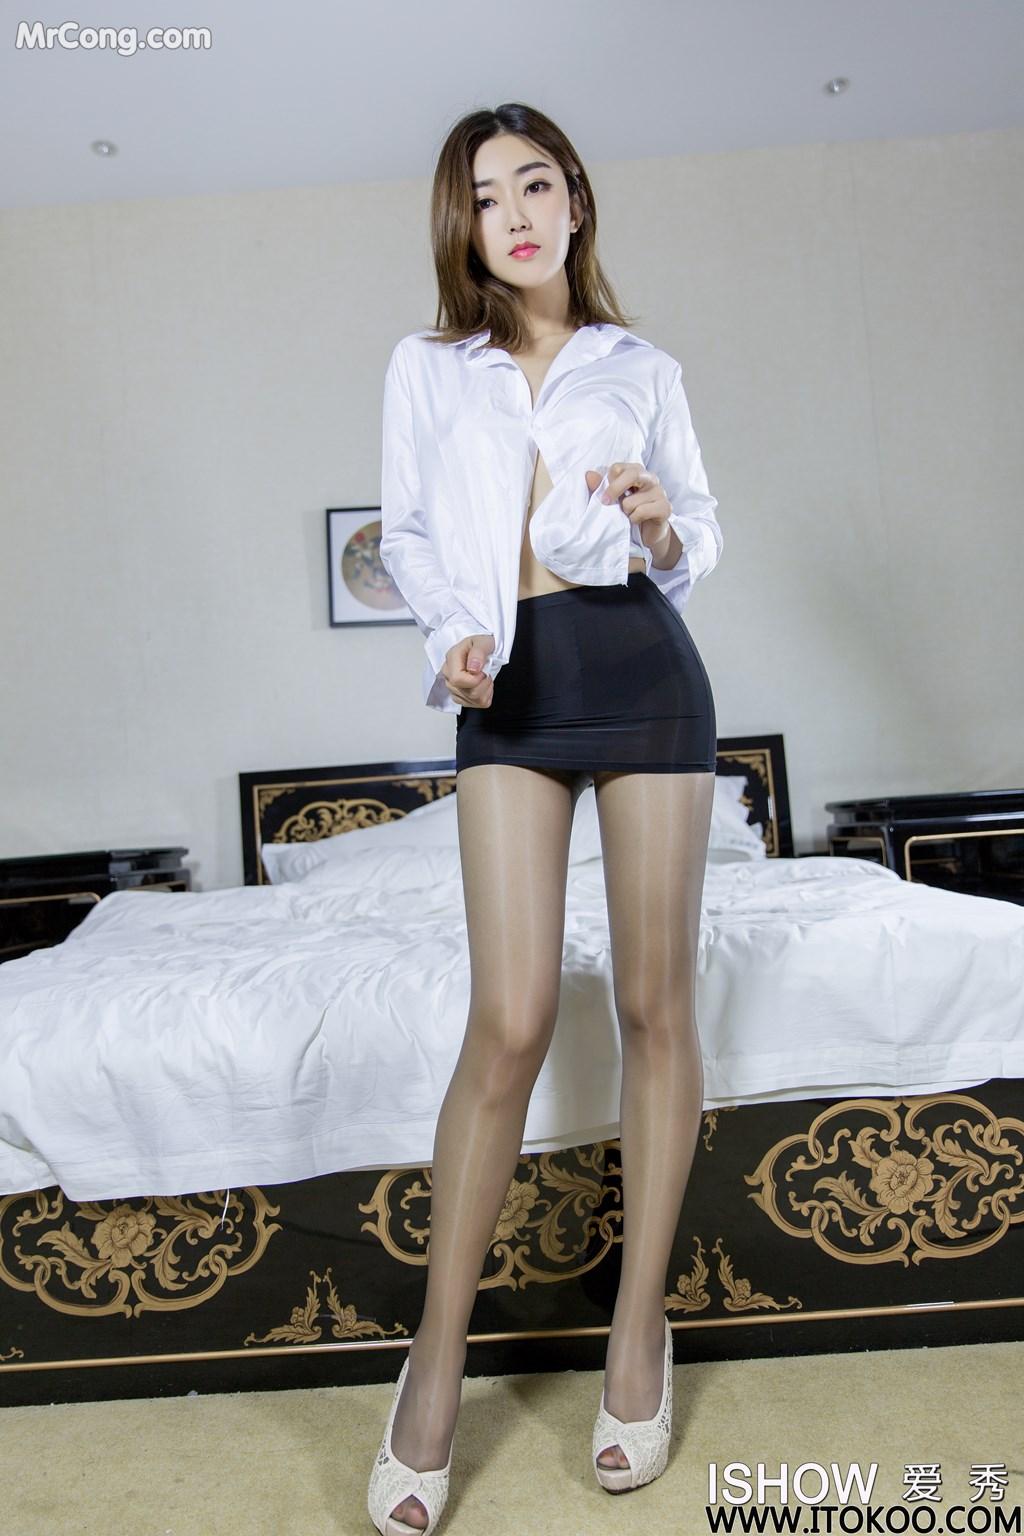 Image ISHOW-No.153-Caroline-MrCong.com-004 in post ISHOW No.153: Người mẫu 林琳Caroline (31 ảnh)